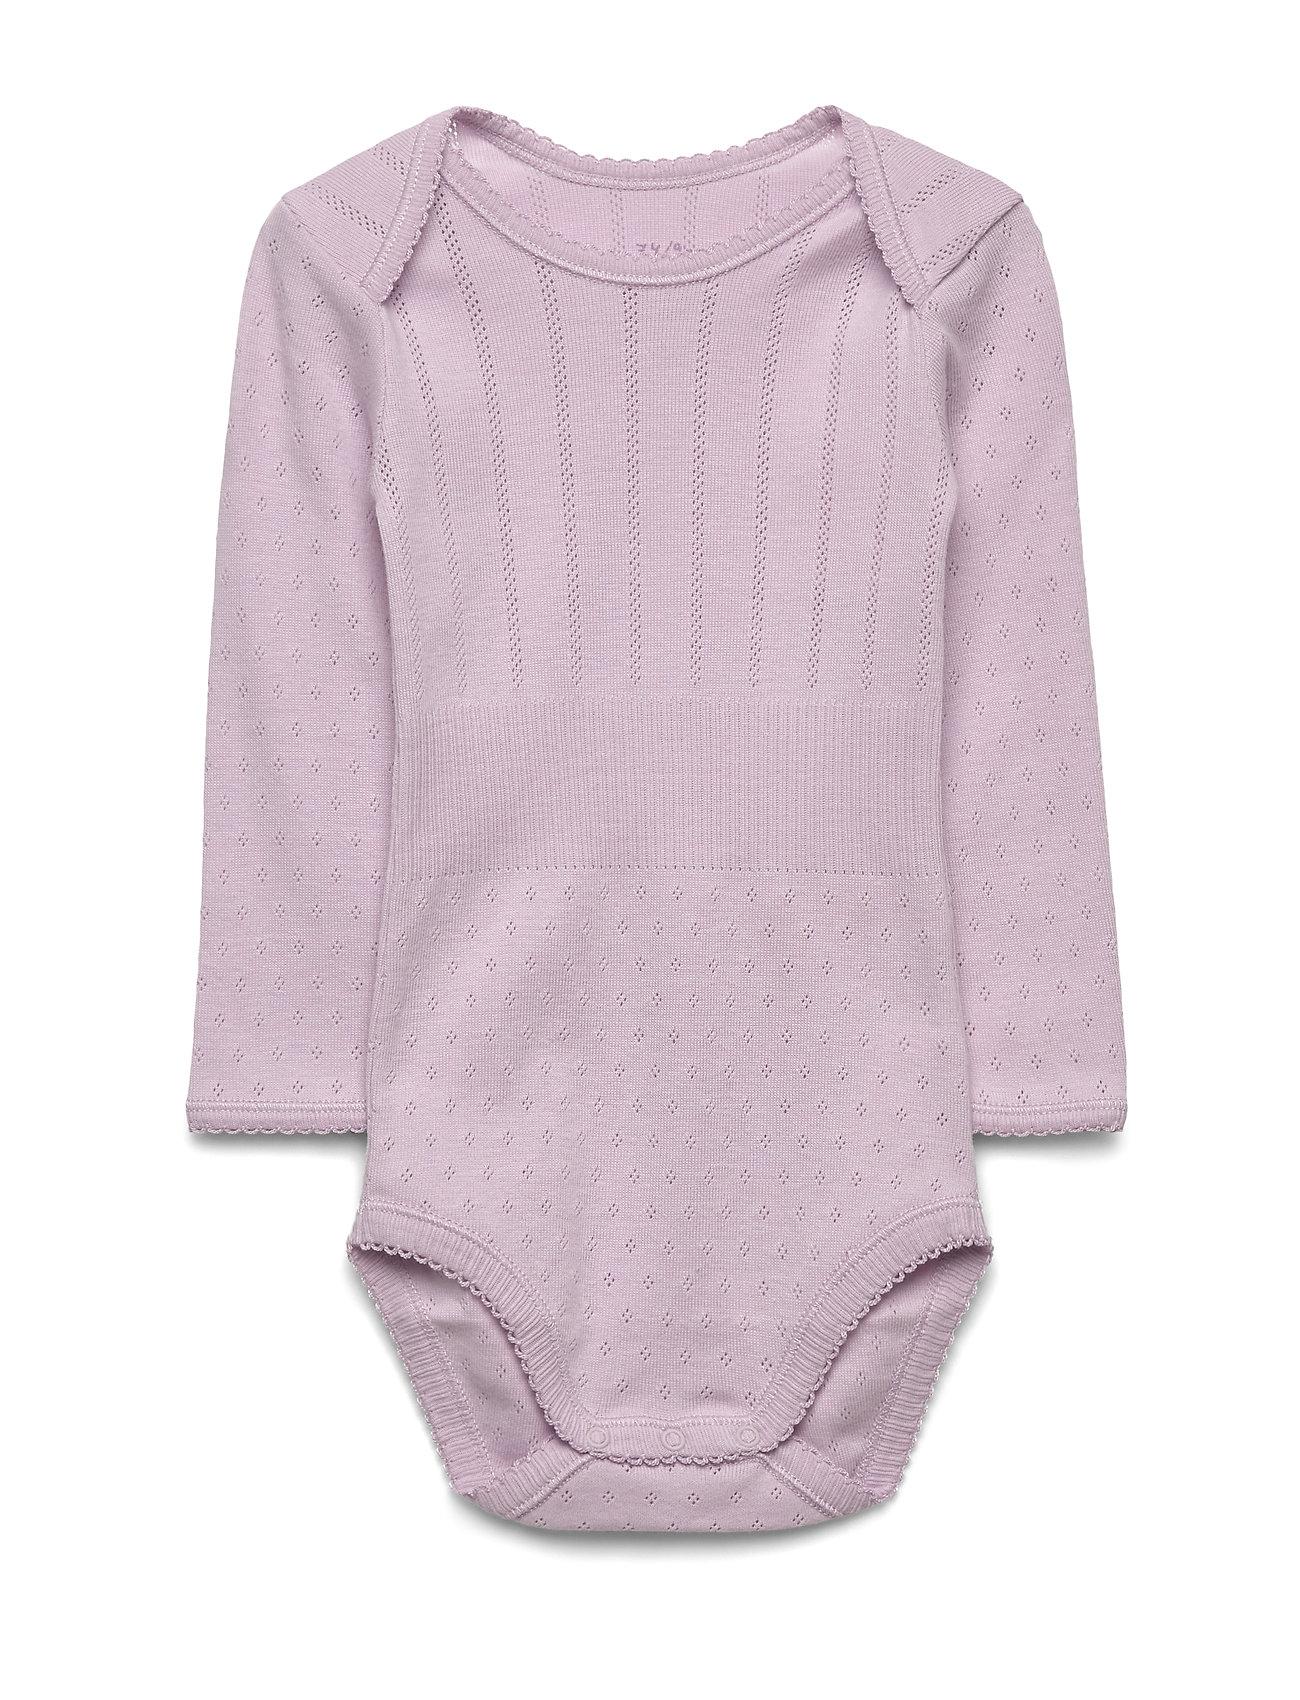 Noa Noa Miniature Baby Body - LAVENDER FROST